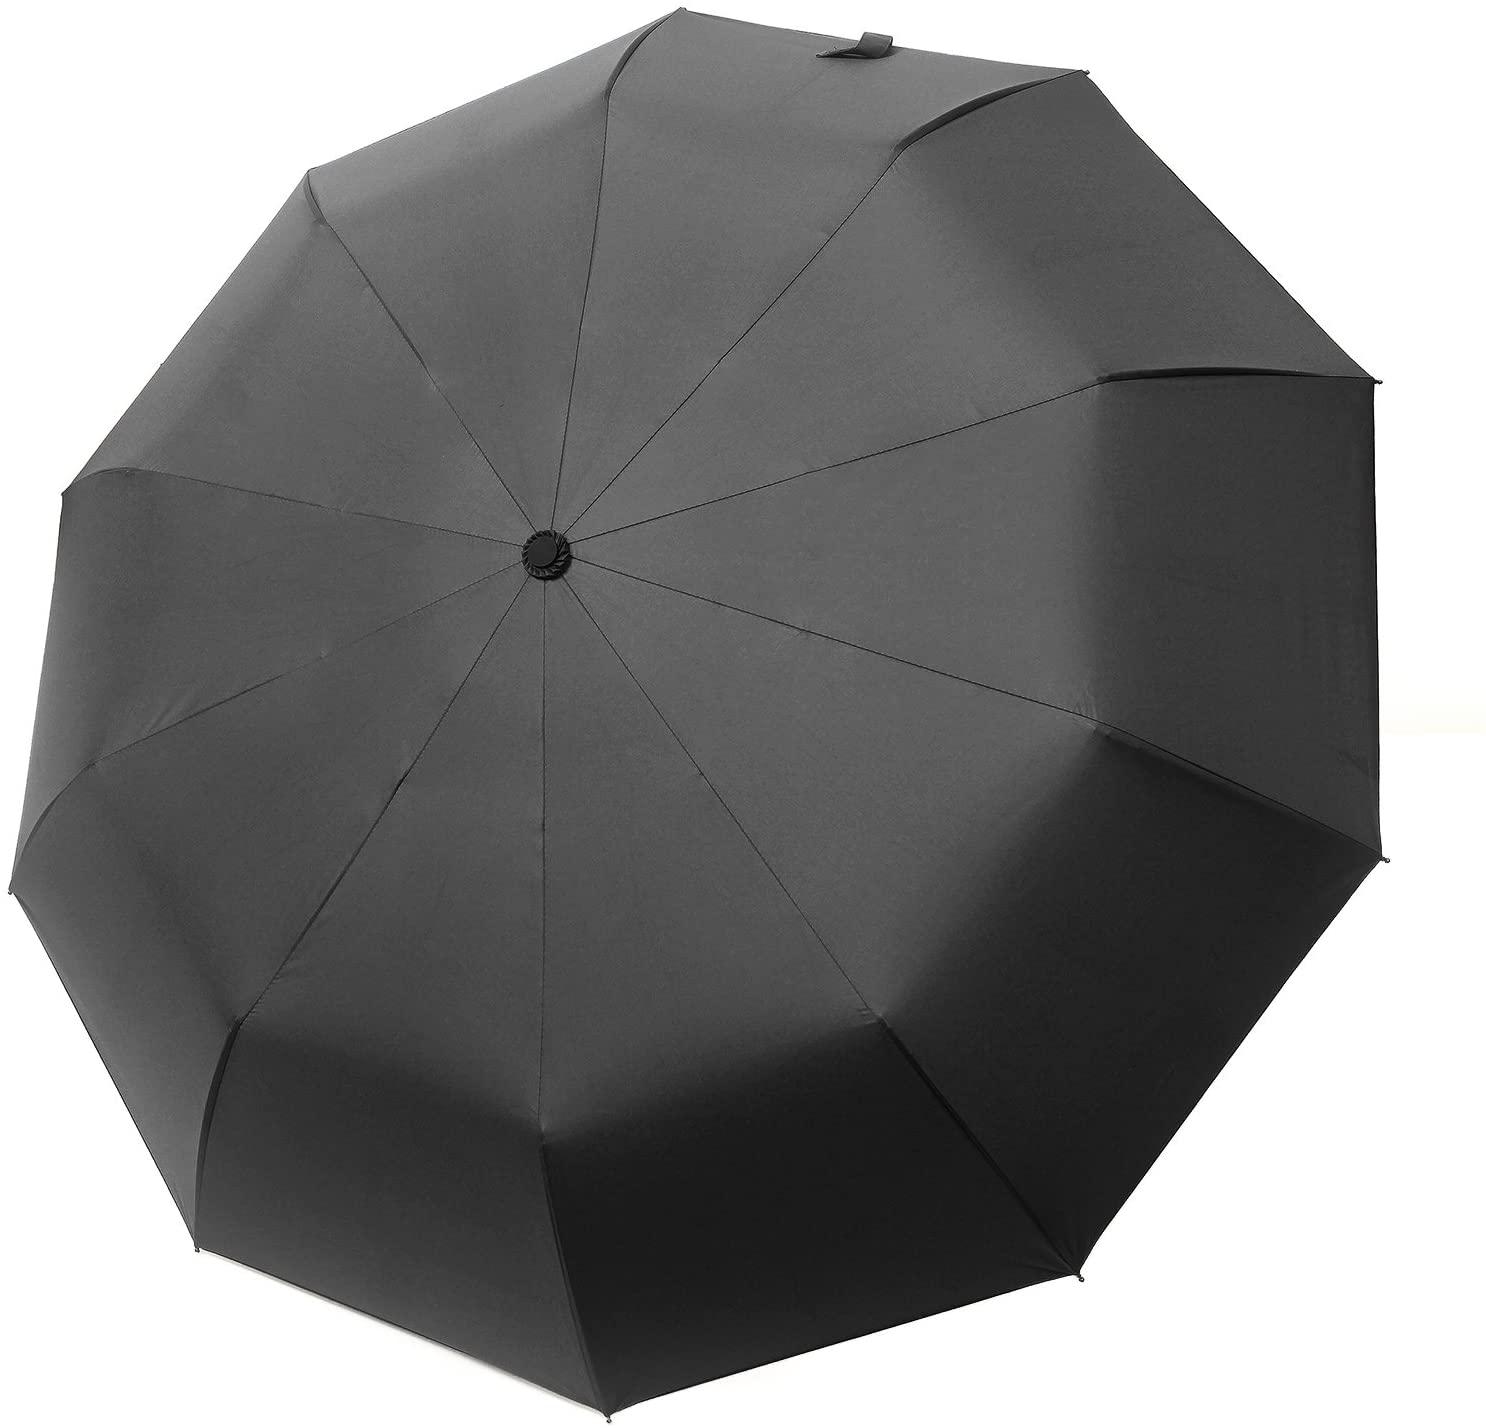 HONGYUE Ranson Compact Travel Umbrella